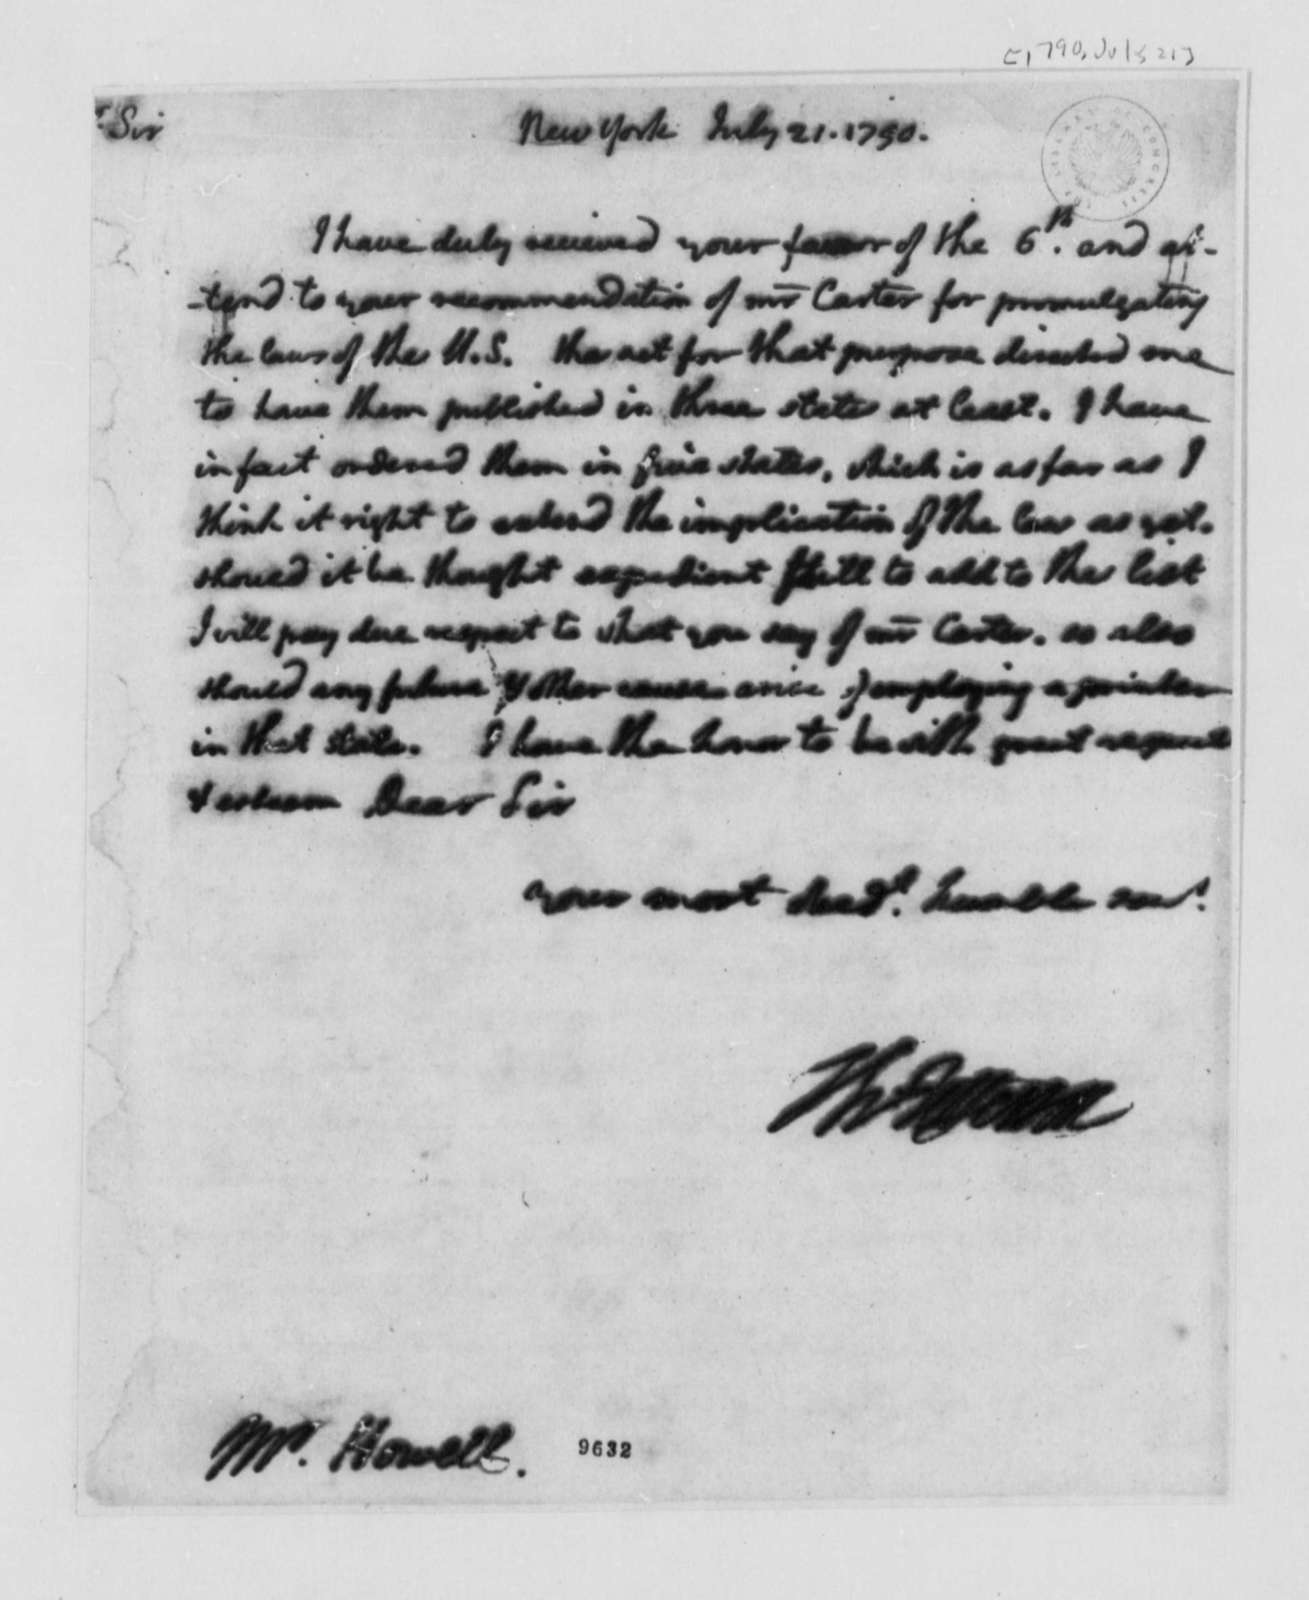 Thomas Jefferson to David Howell, July 21, 1790